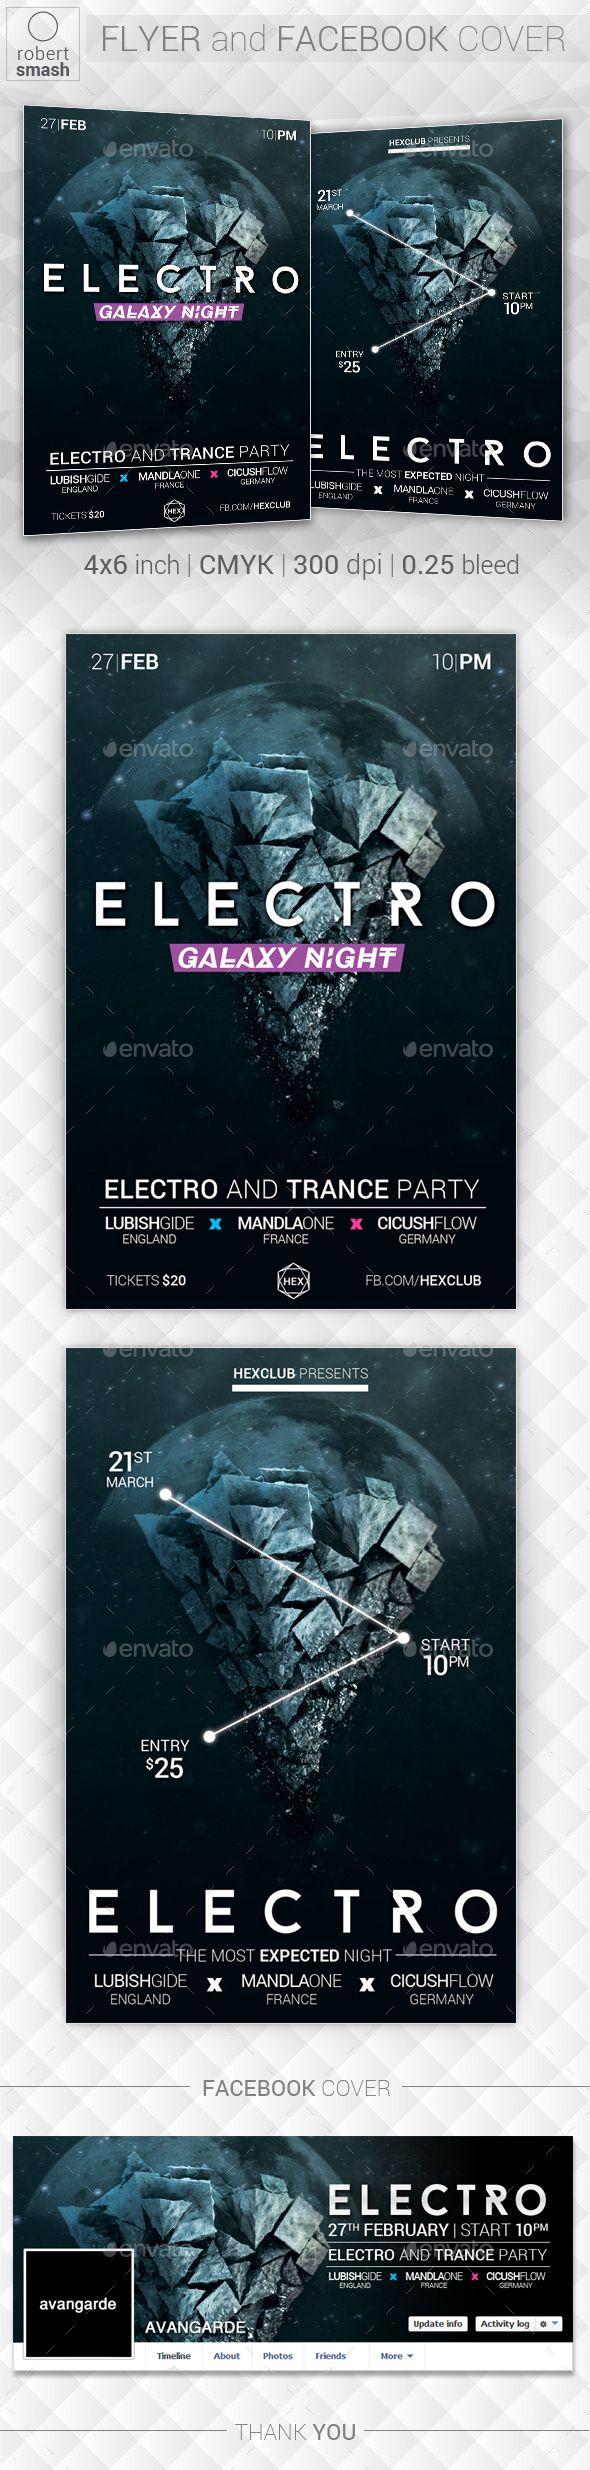 Galaxy Night Music Flyer. Download: https://graphicriver.net/item/galaxy-night-music-flyer/18720046?ref=thanhdesign